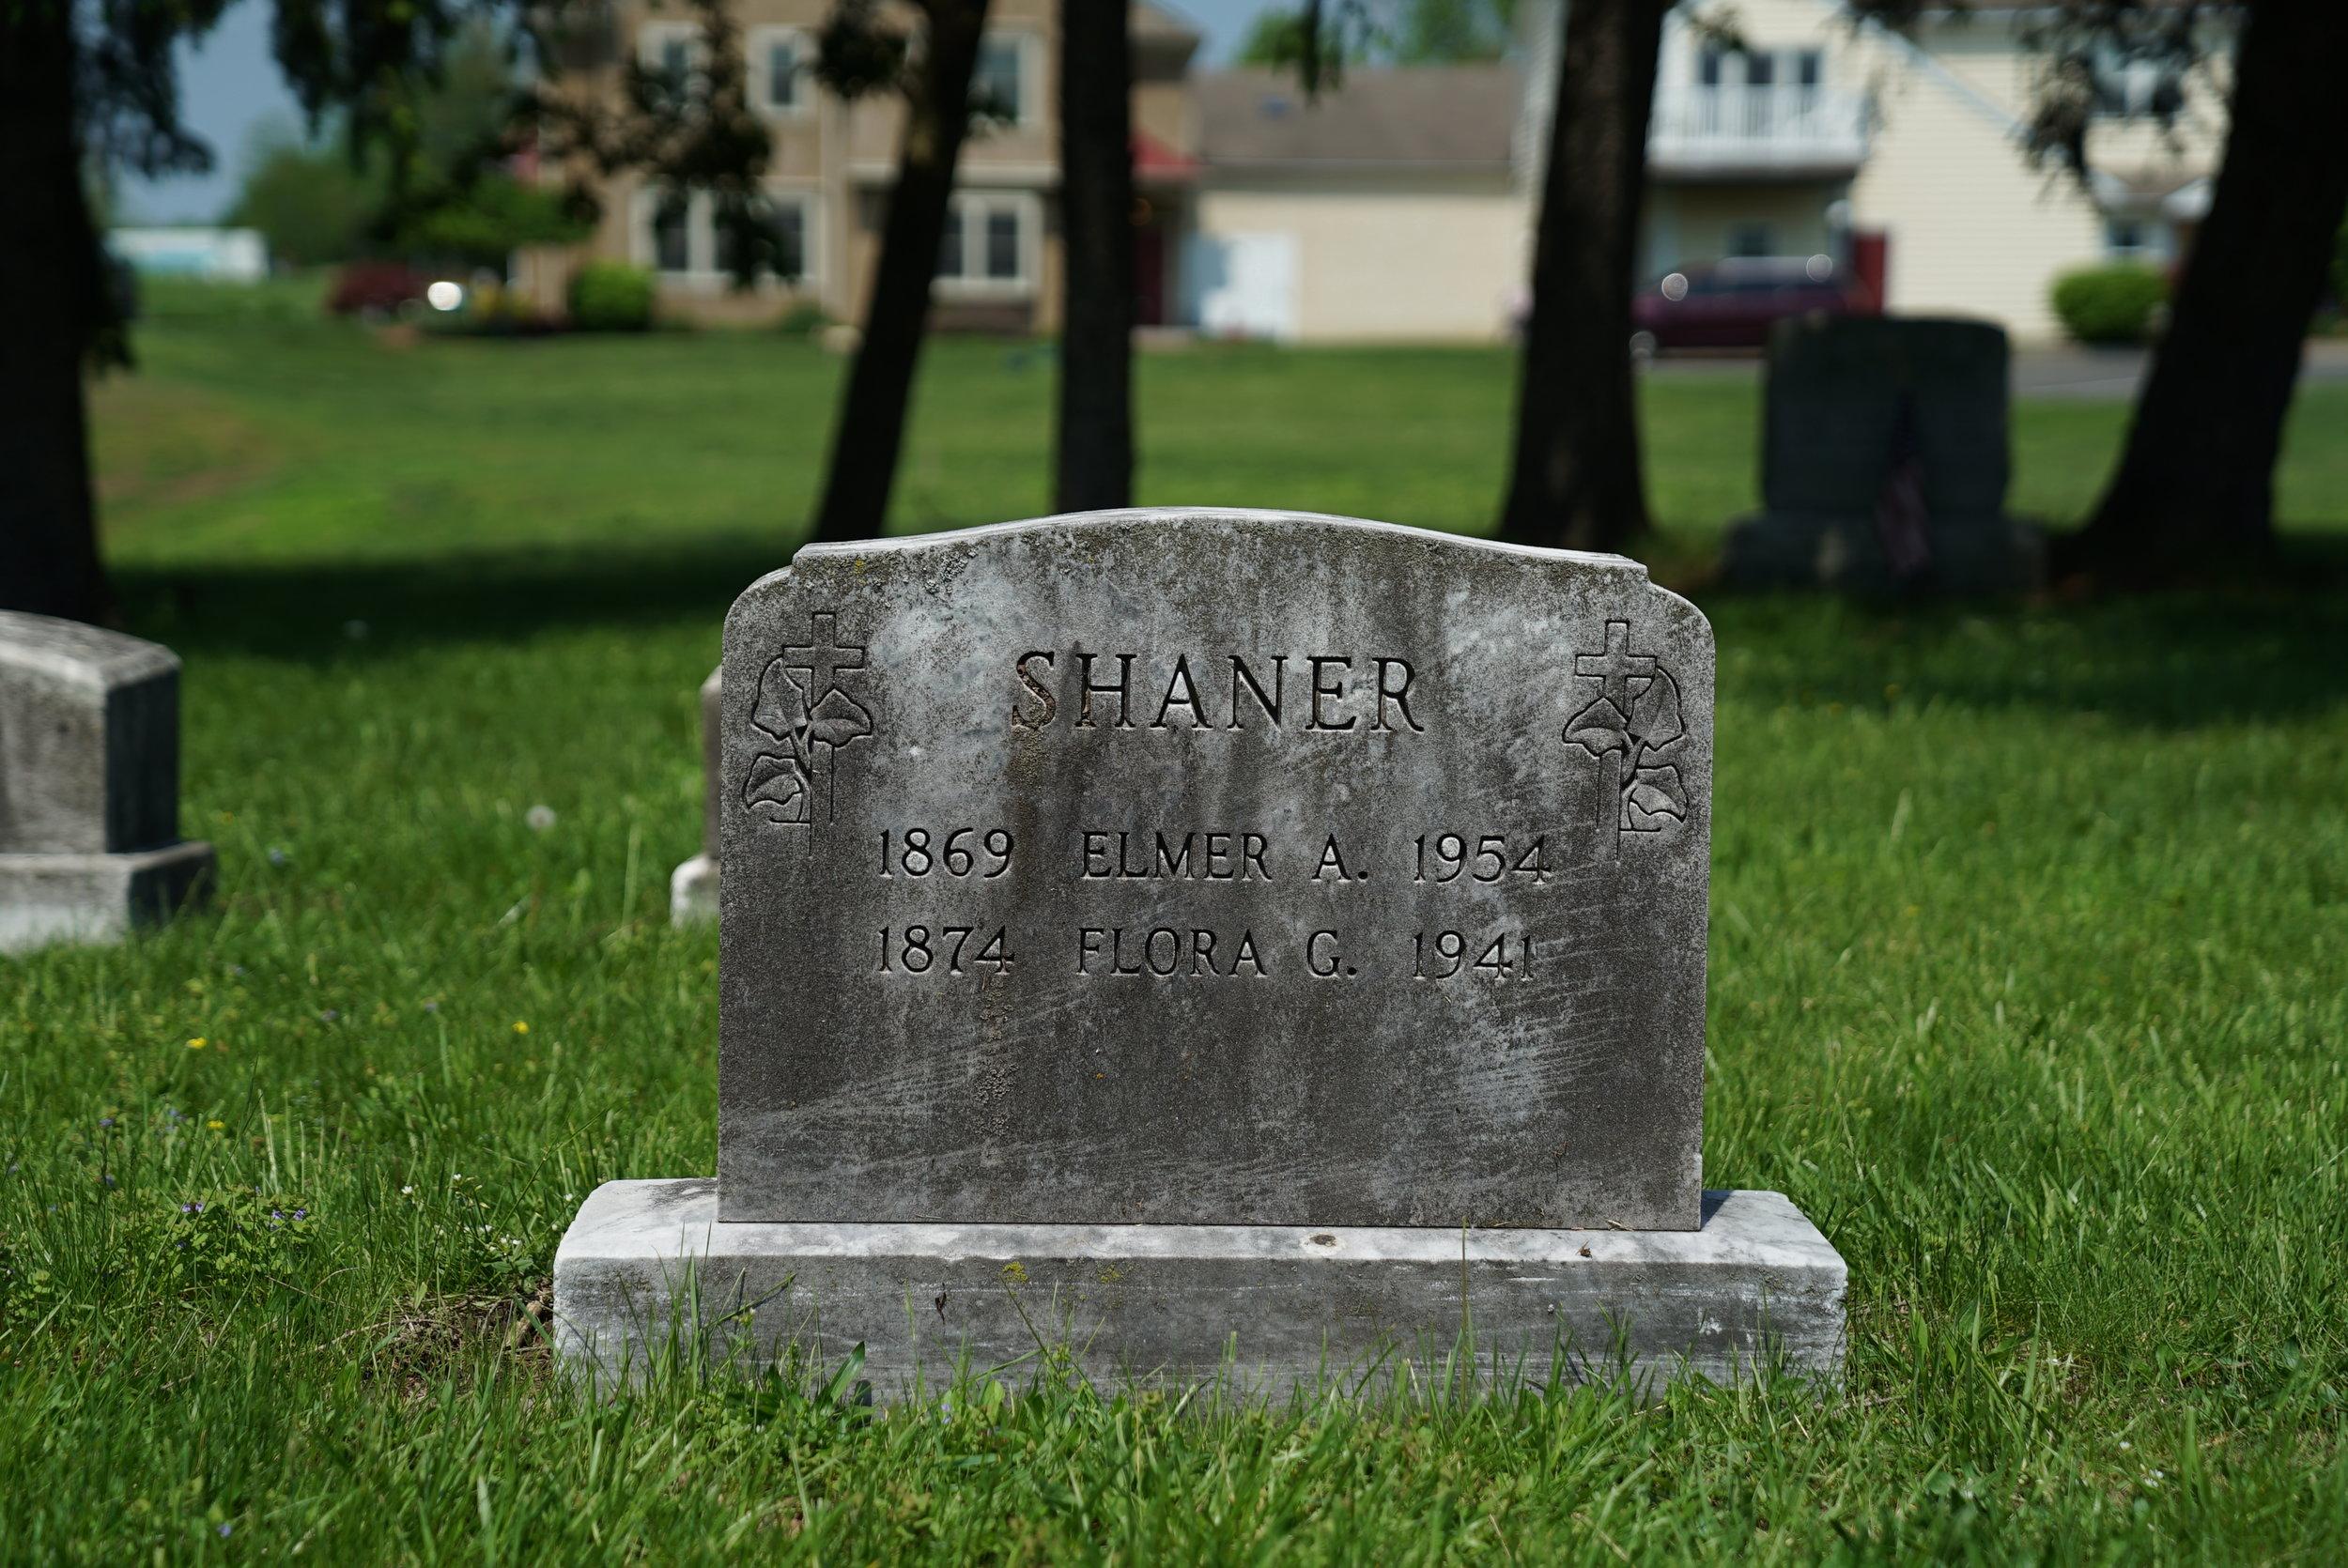 Tombstone at Christ Evangelical Congregational Church Cemetery. Zieglerville, Pennsylvania.